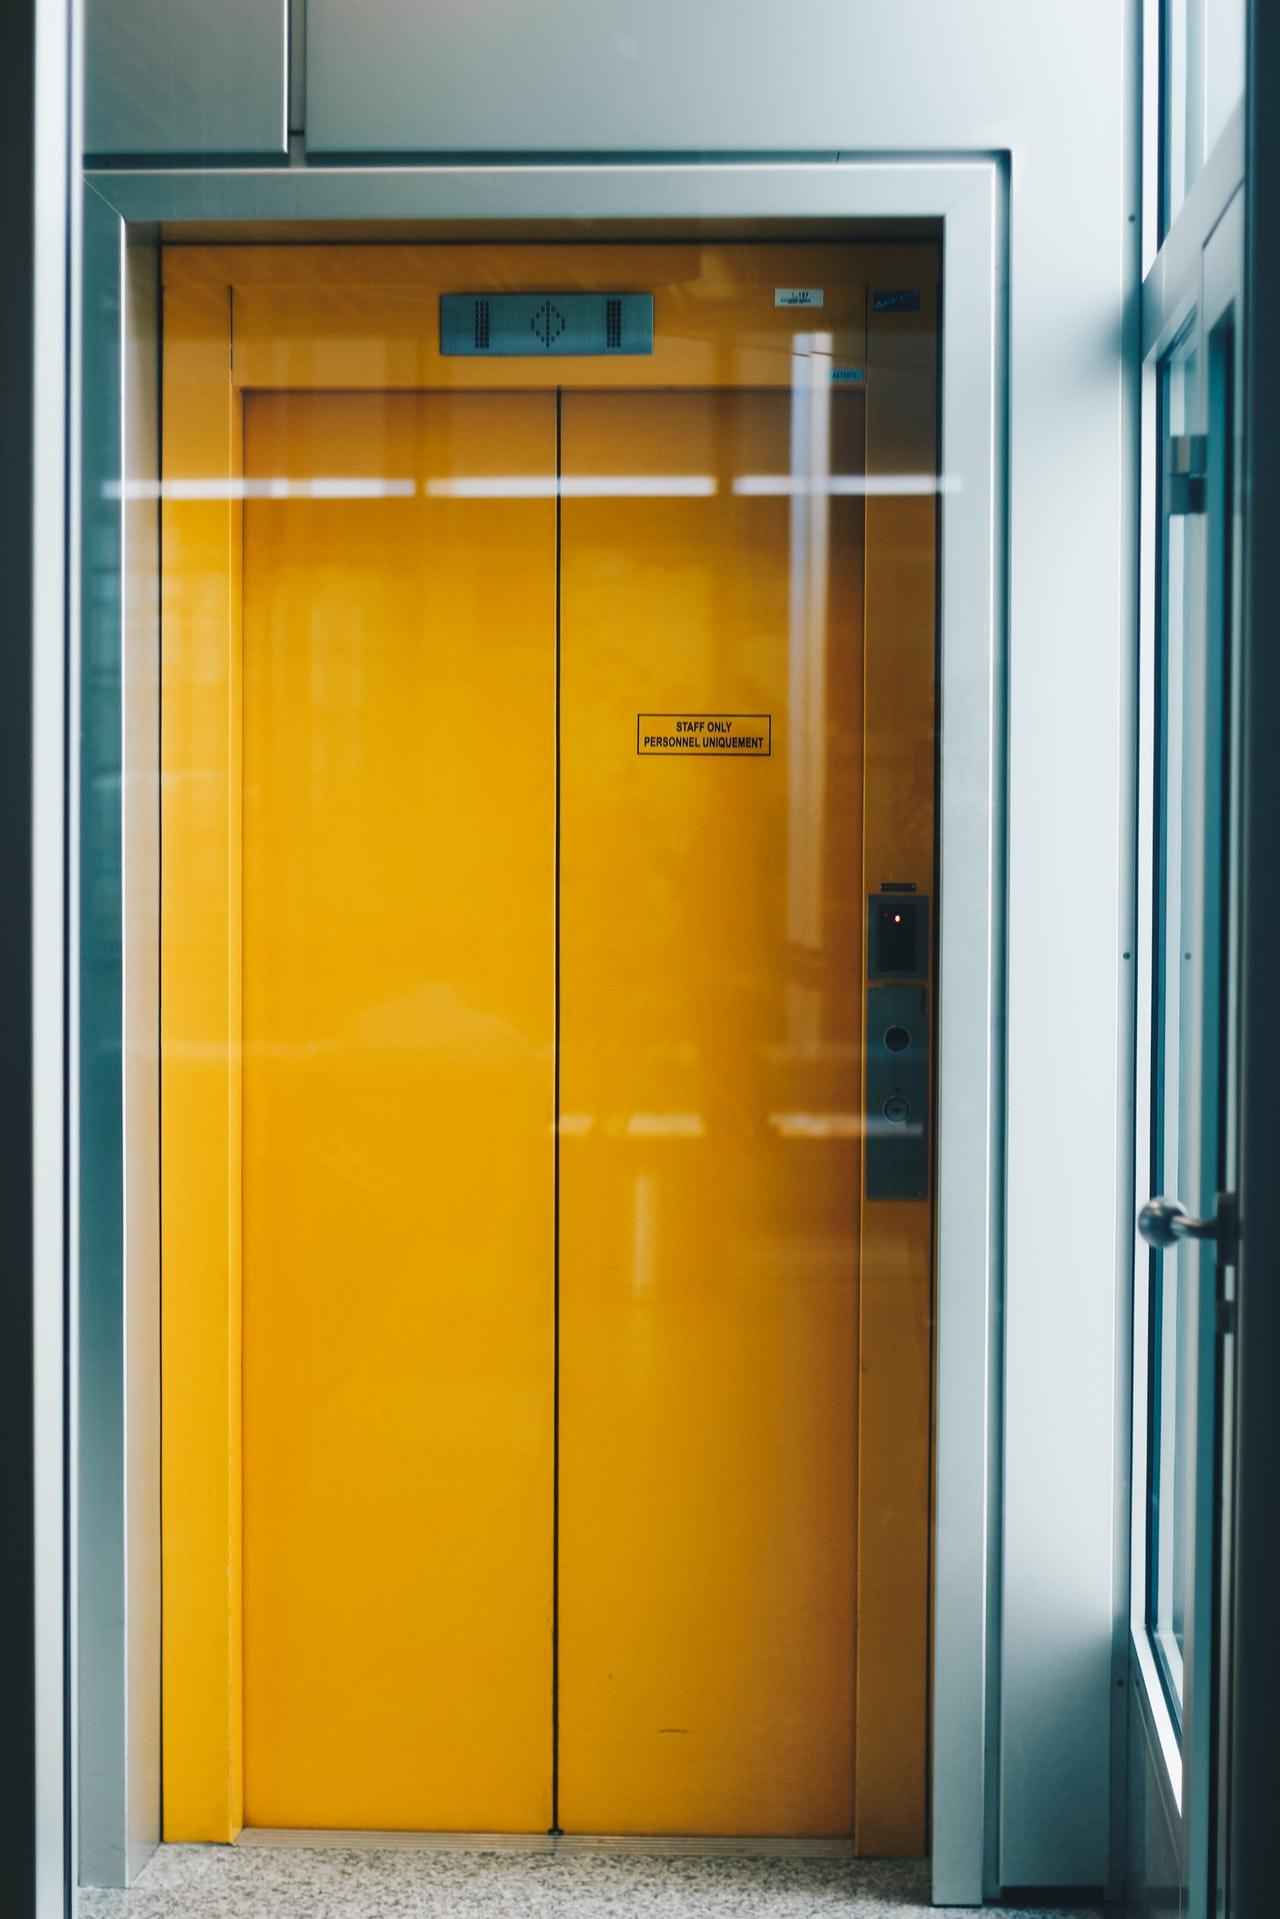 Fossa ascensori: le deroghe ammesse